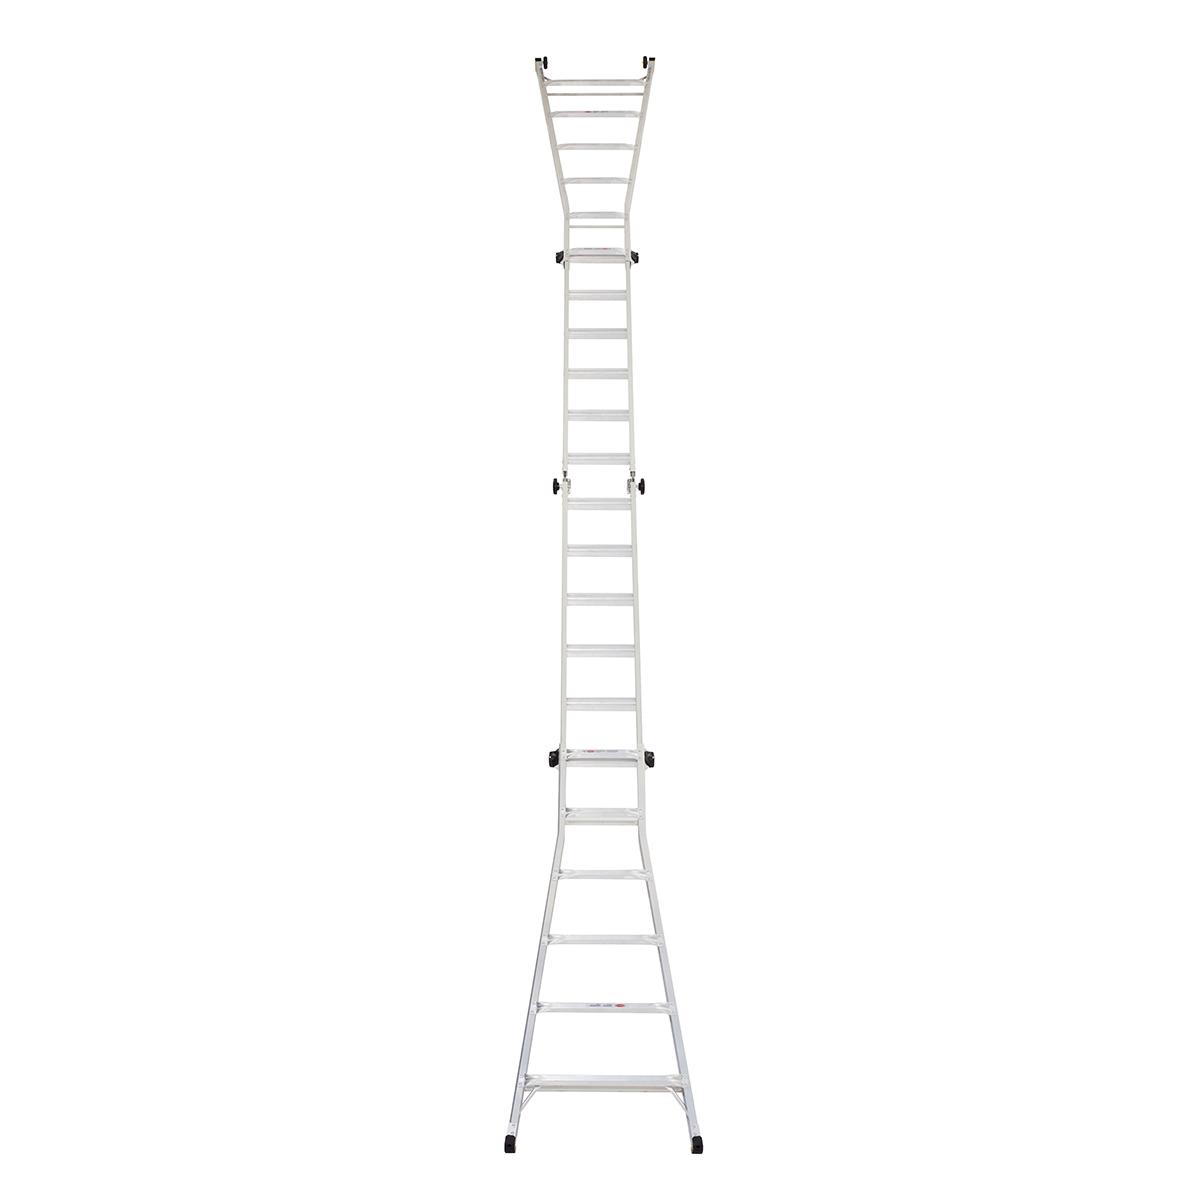 Gorilla LaddersGLA-MPX 26W - Gorilla Ladders